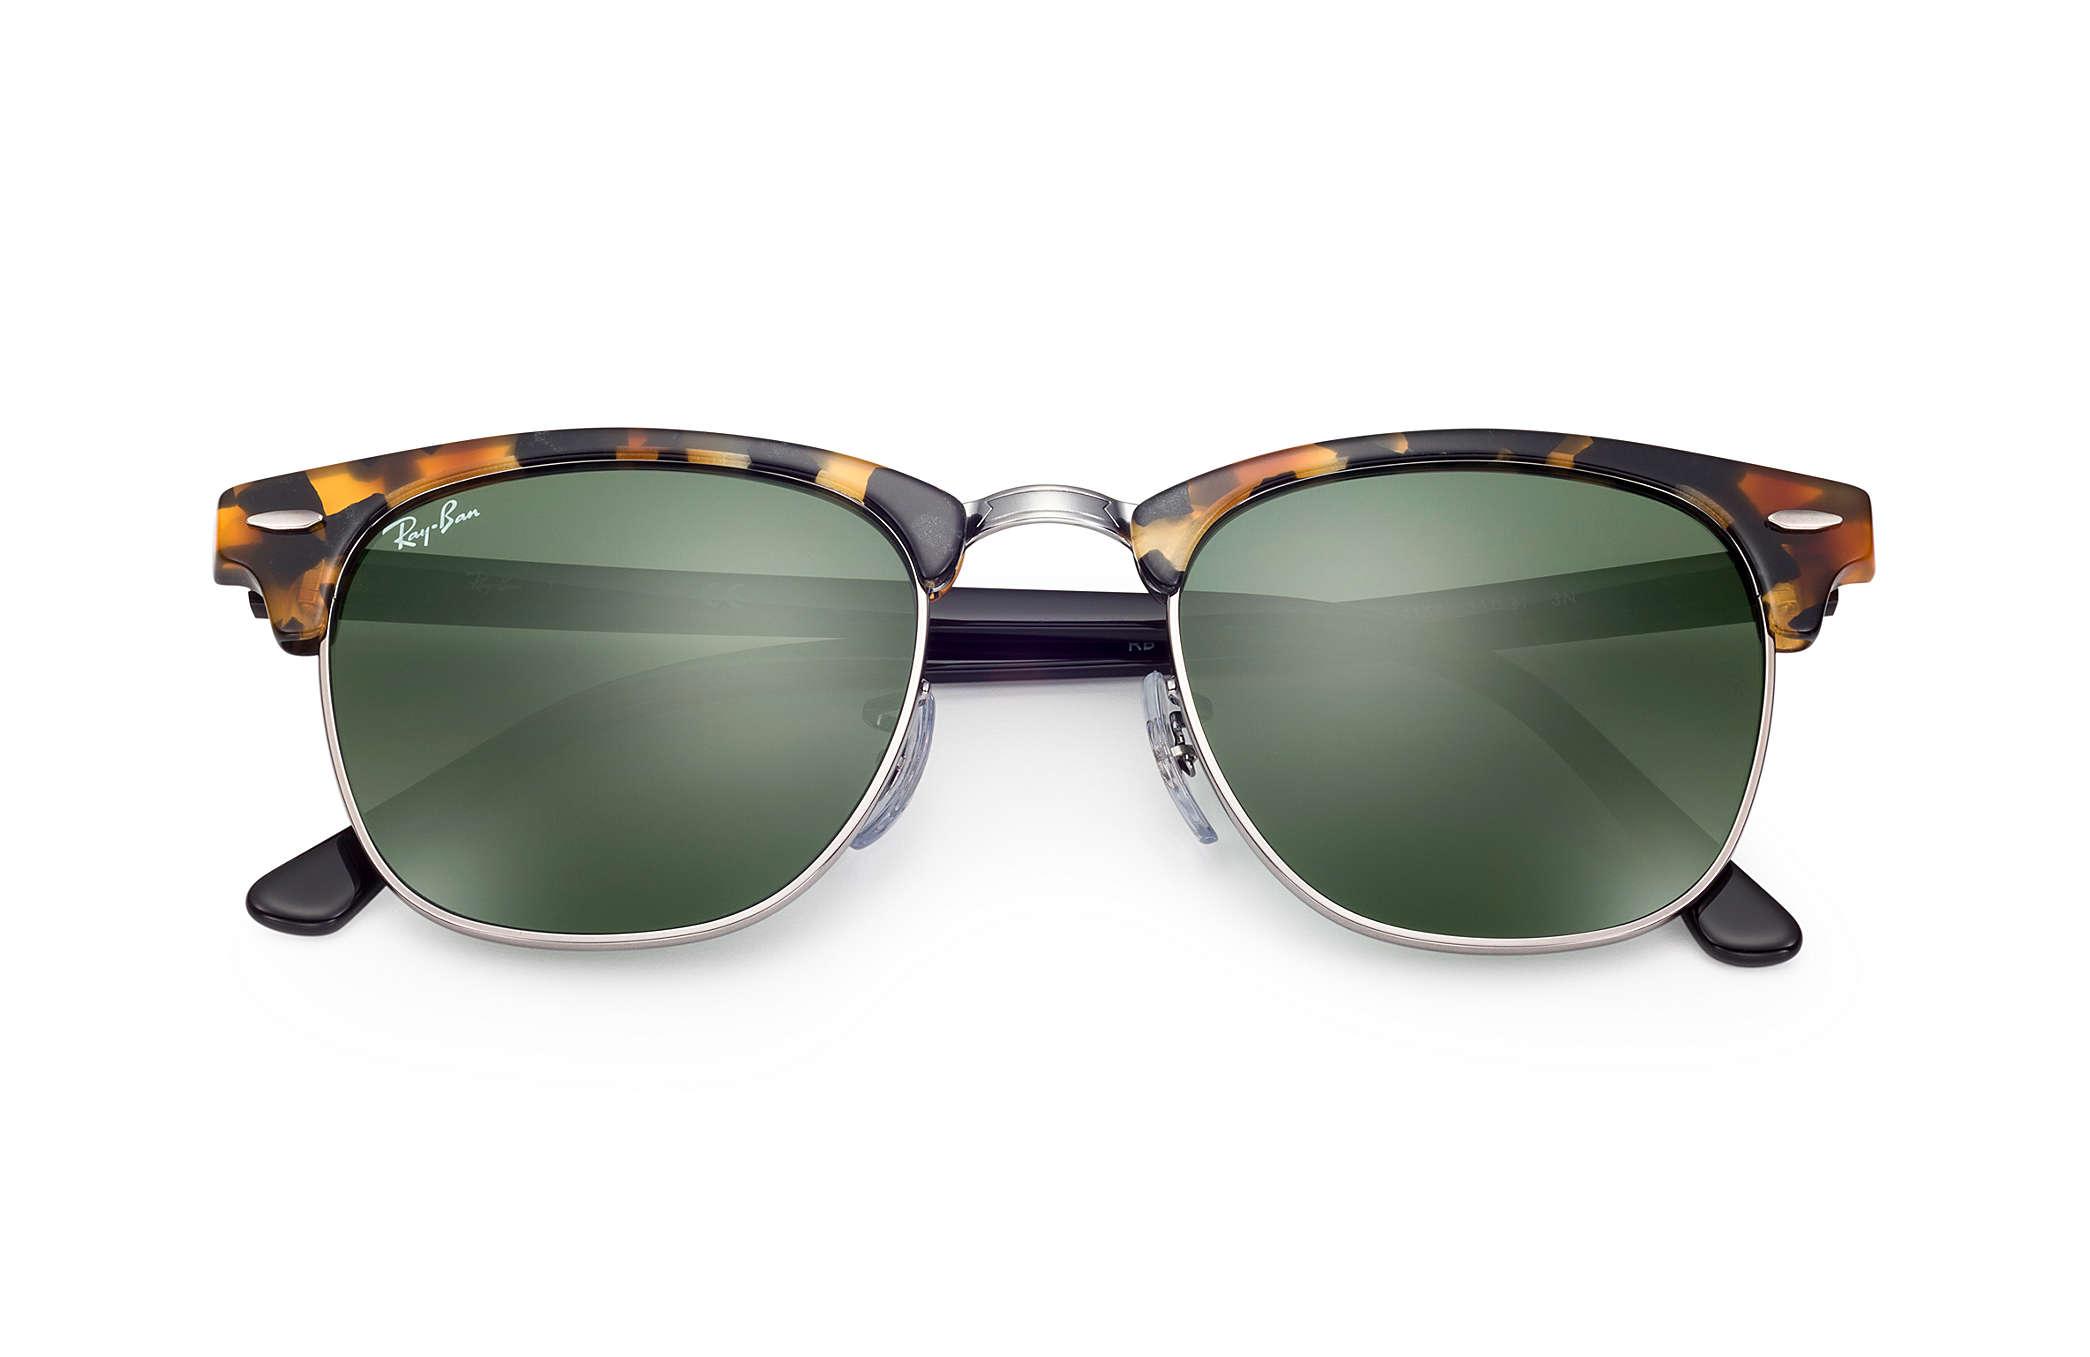 f6203d69249 Ray-Ban Clubmaster Fleck RB3016 Tortoise - Acetate - Green Lenses ...